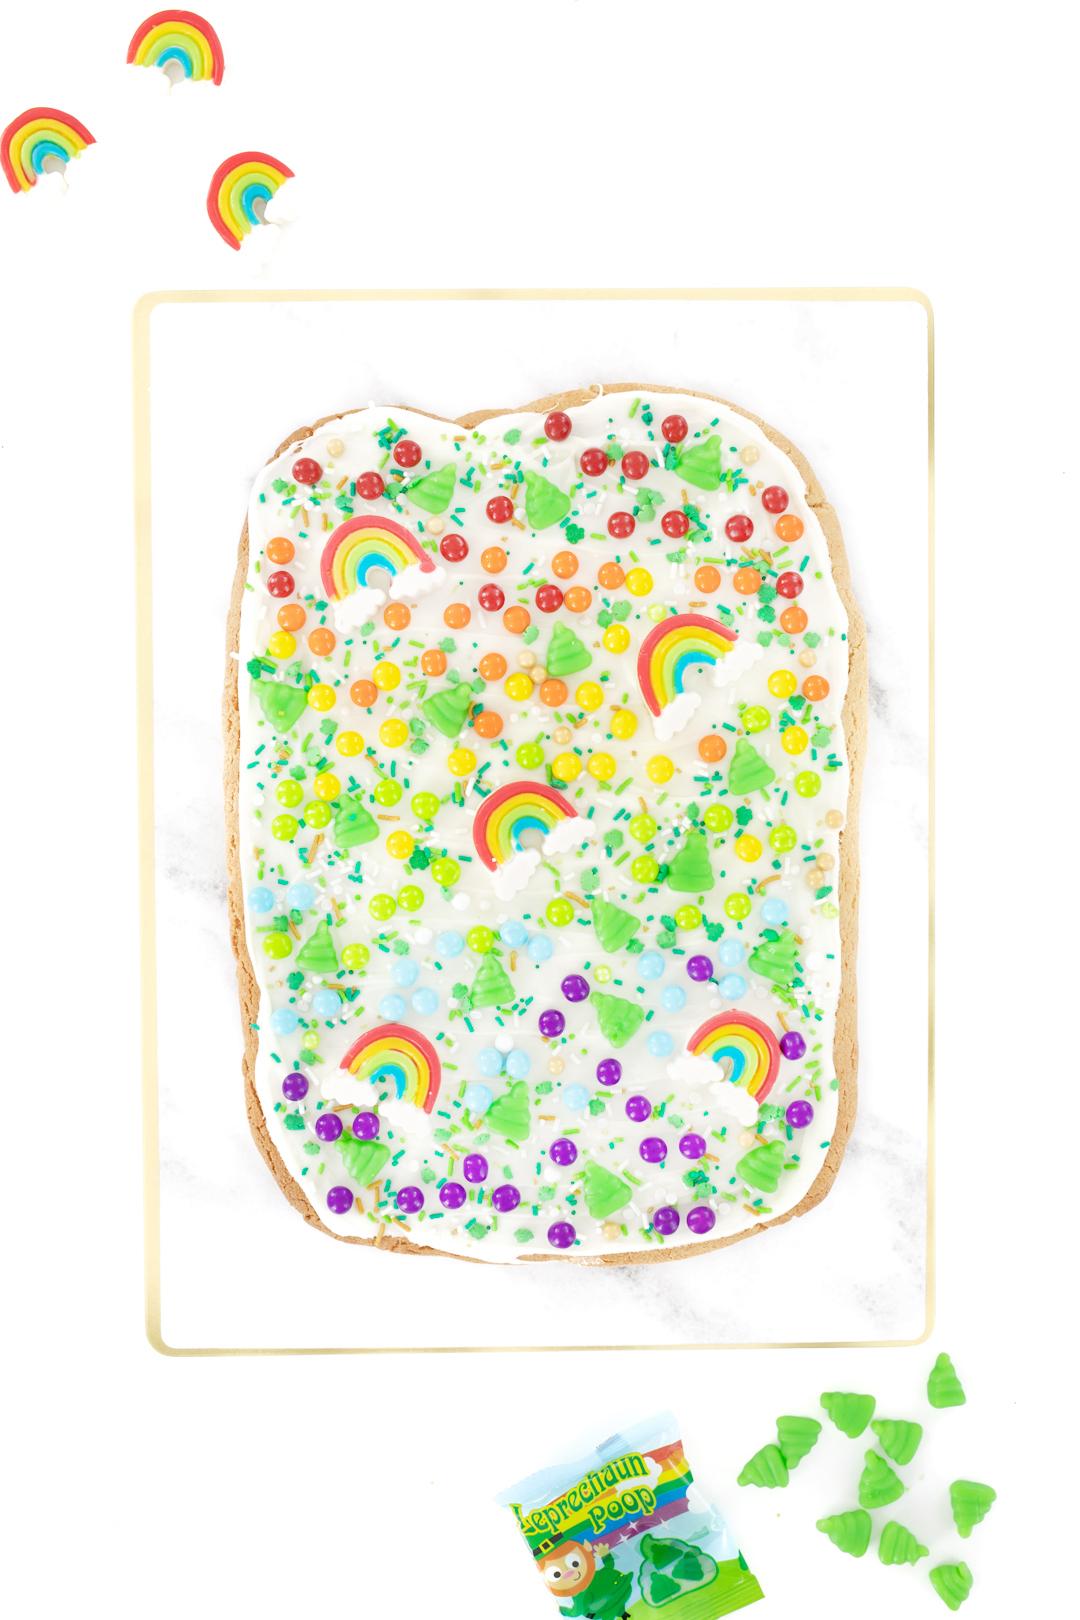 pretty rainbow cookie bark with rainbow candies, rainbow gummies and Leprechaun poop candies.